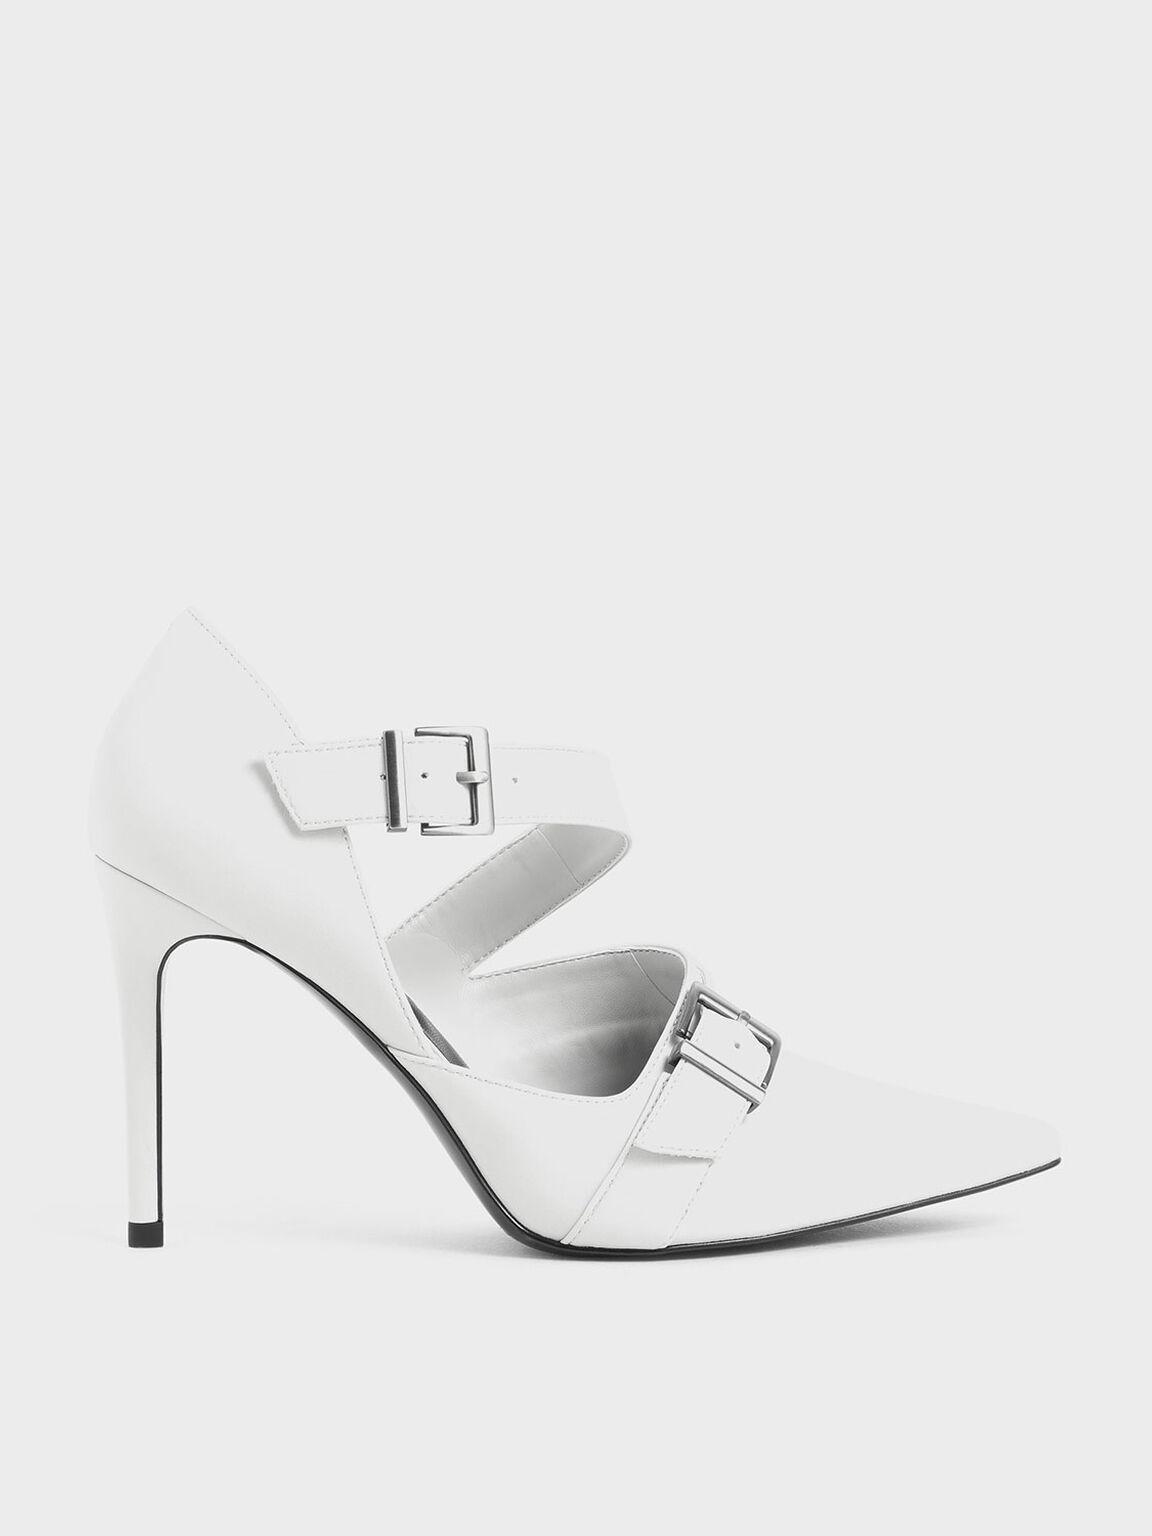 Strappy D'Orsay Stiletto Pumps, White, hi-res